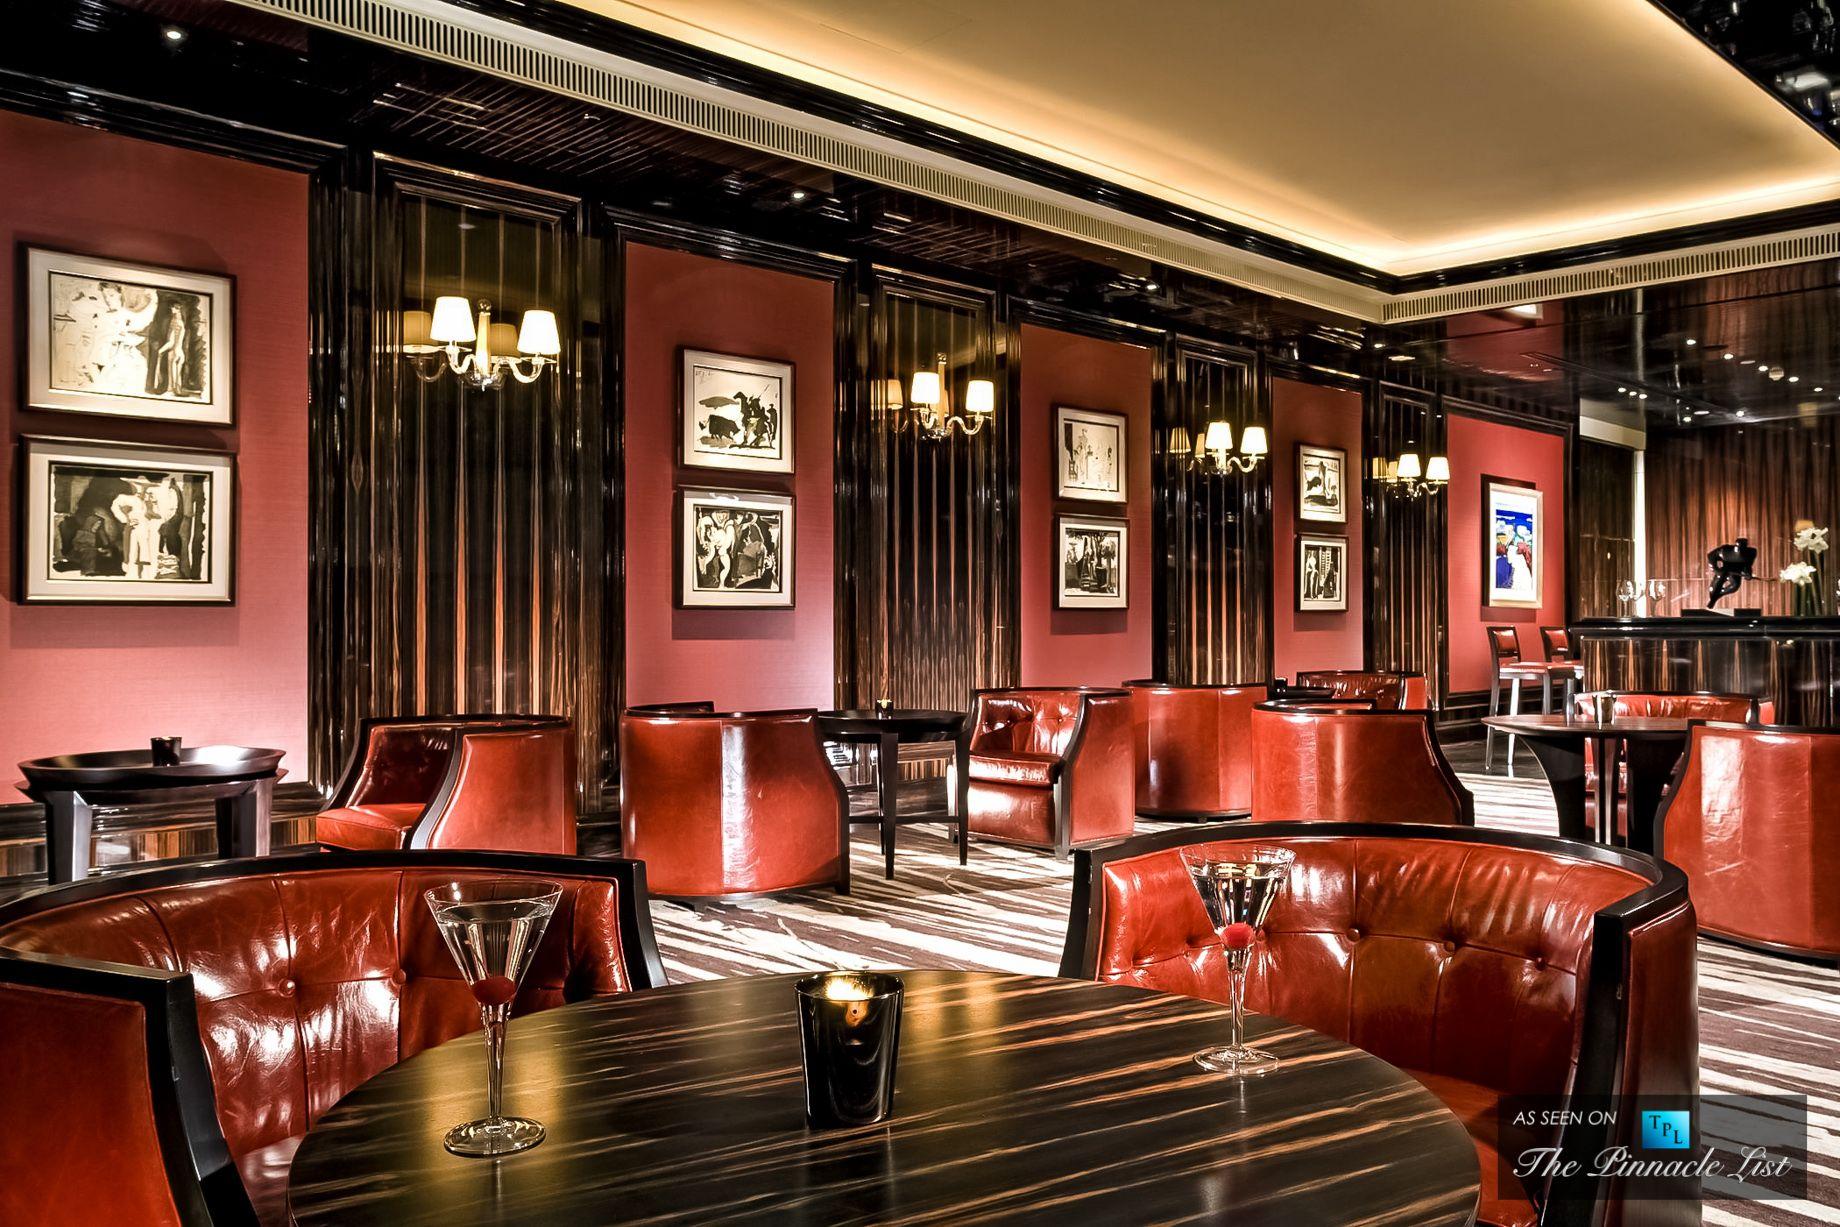 khamvongsa hotel luxury hotel bar - Google Search